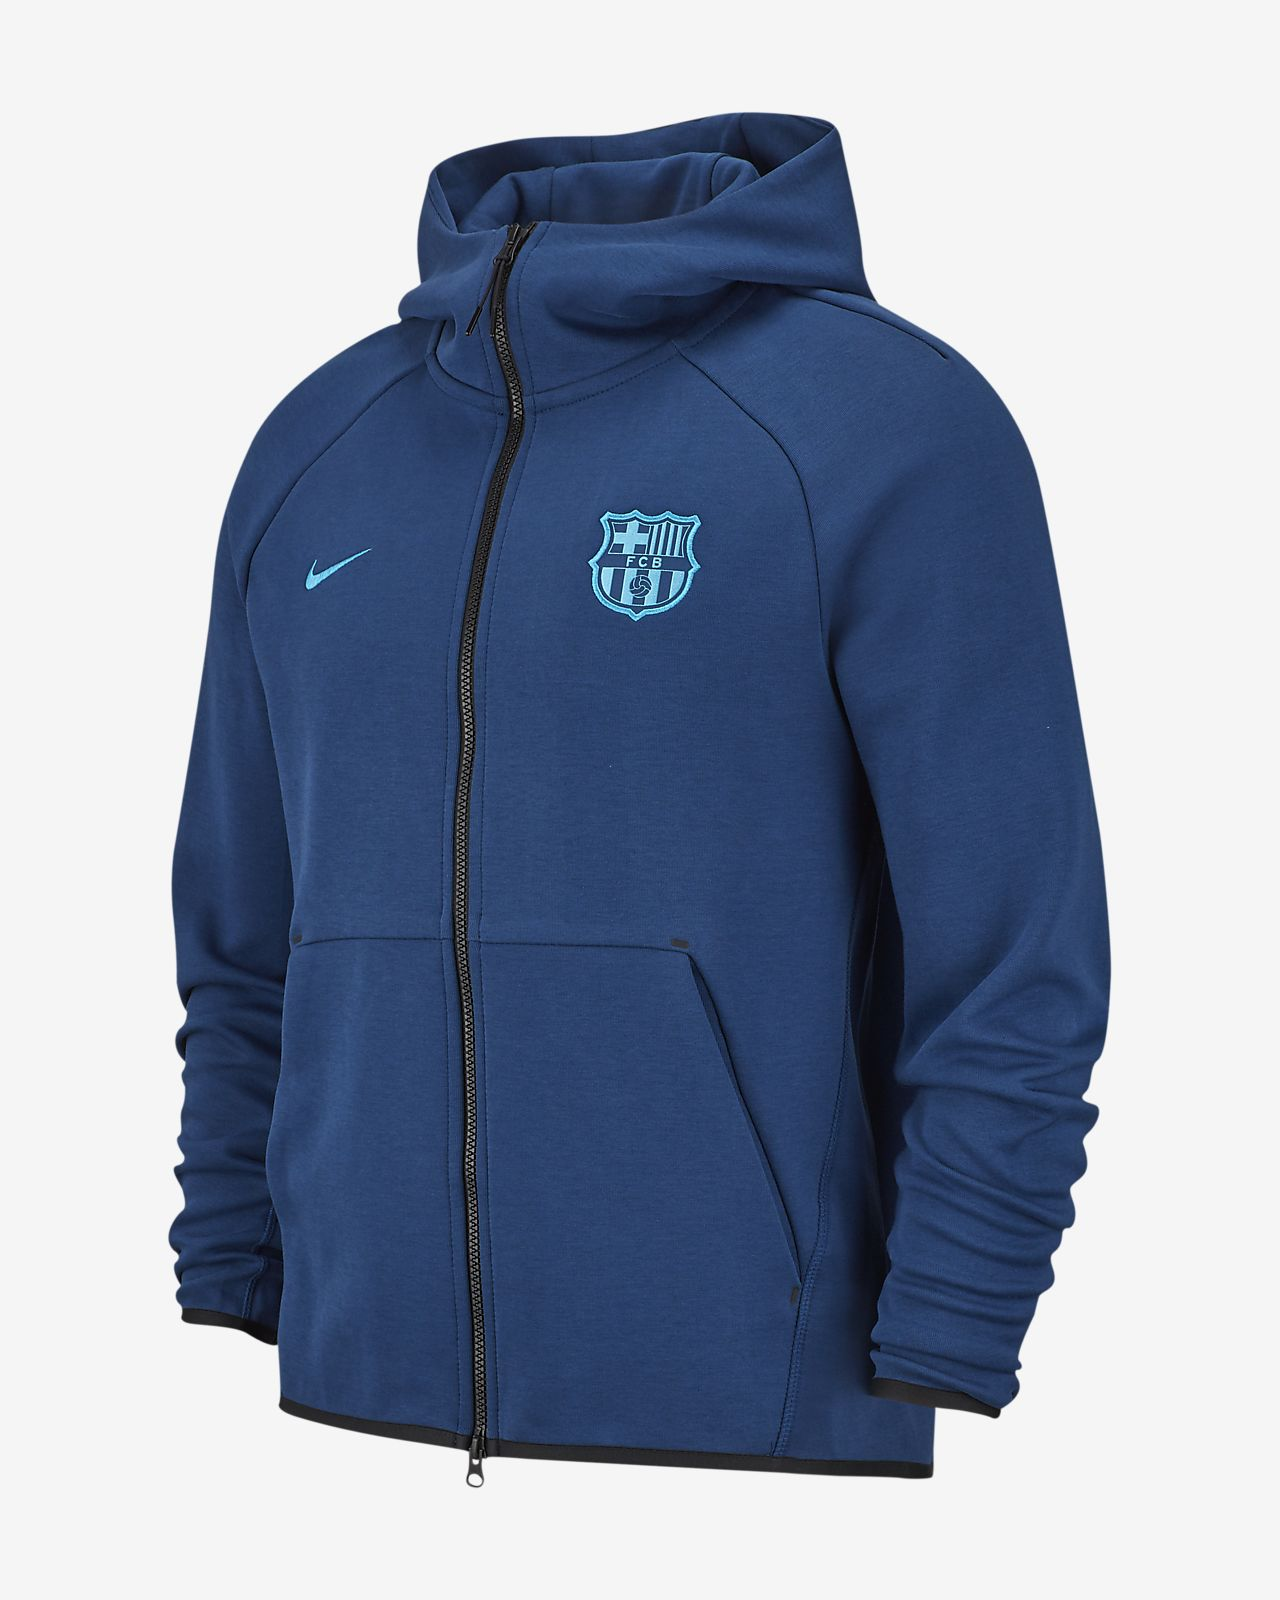 524818e2555eb FC Barcelona Tech Fleece Sudadera con capucha - Hombre. Nike.com ES